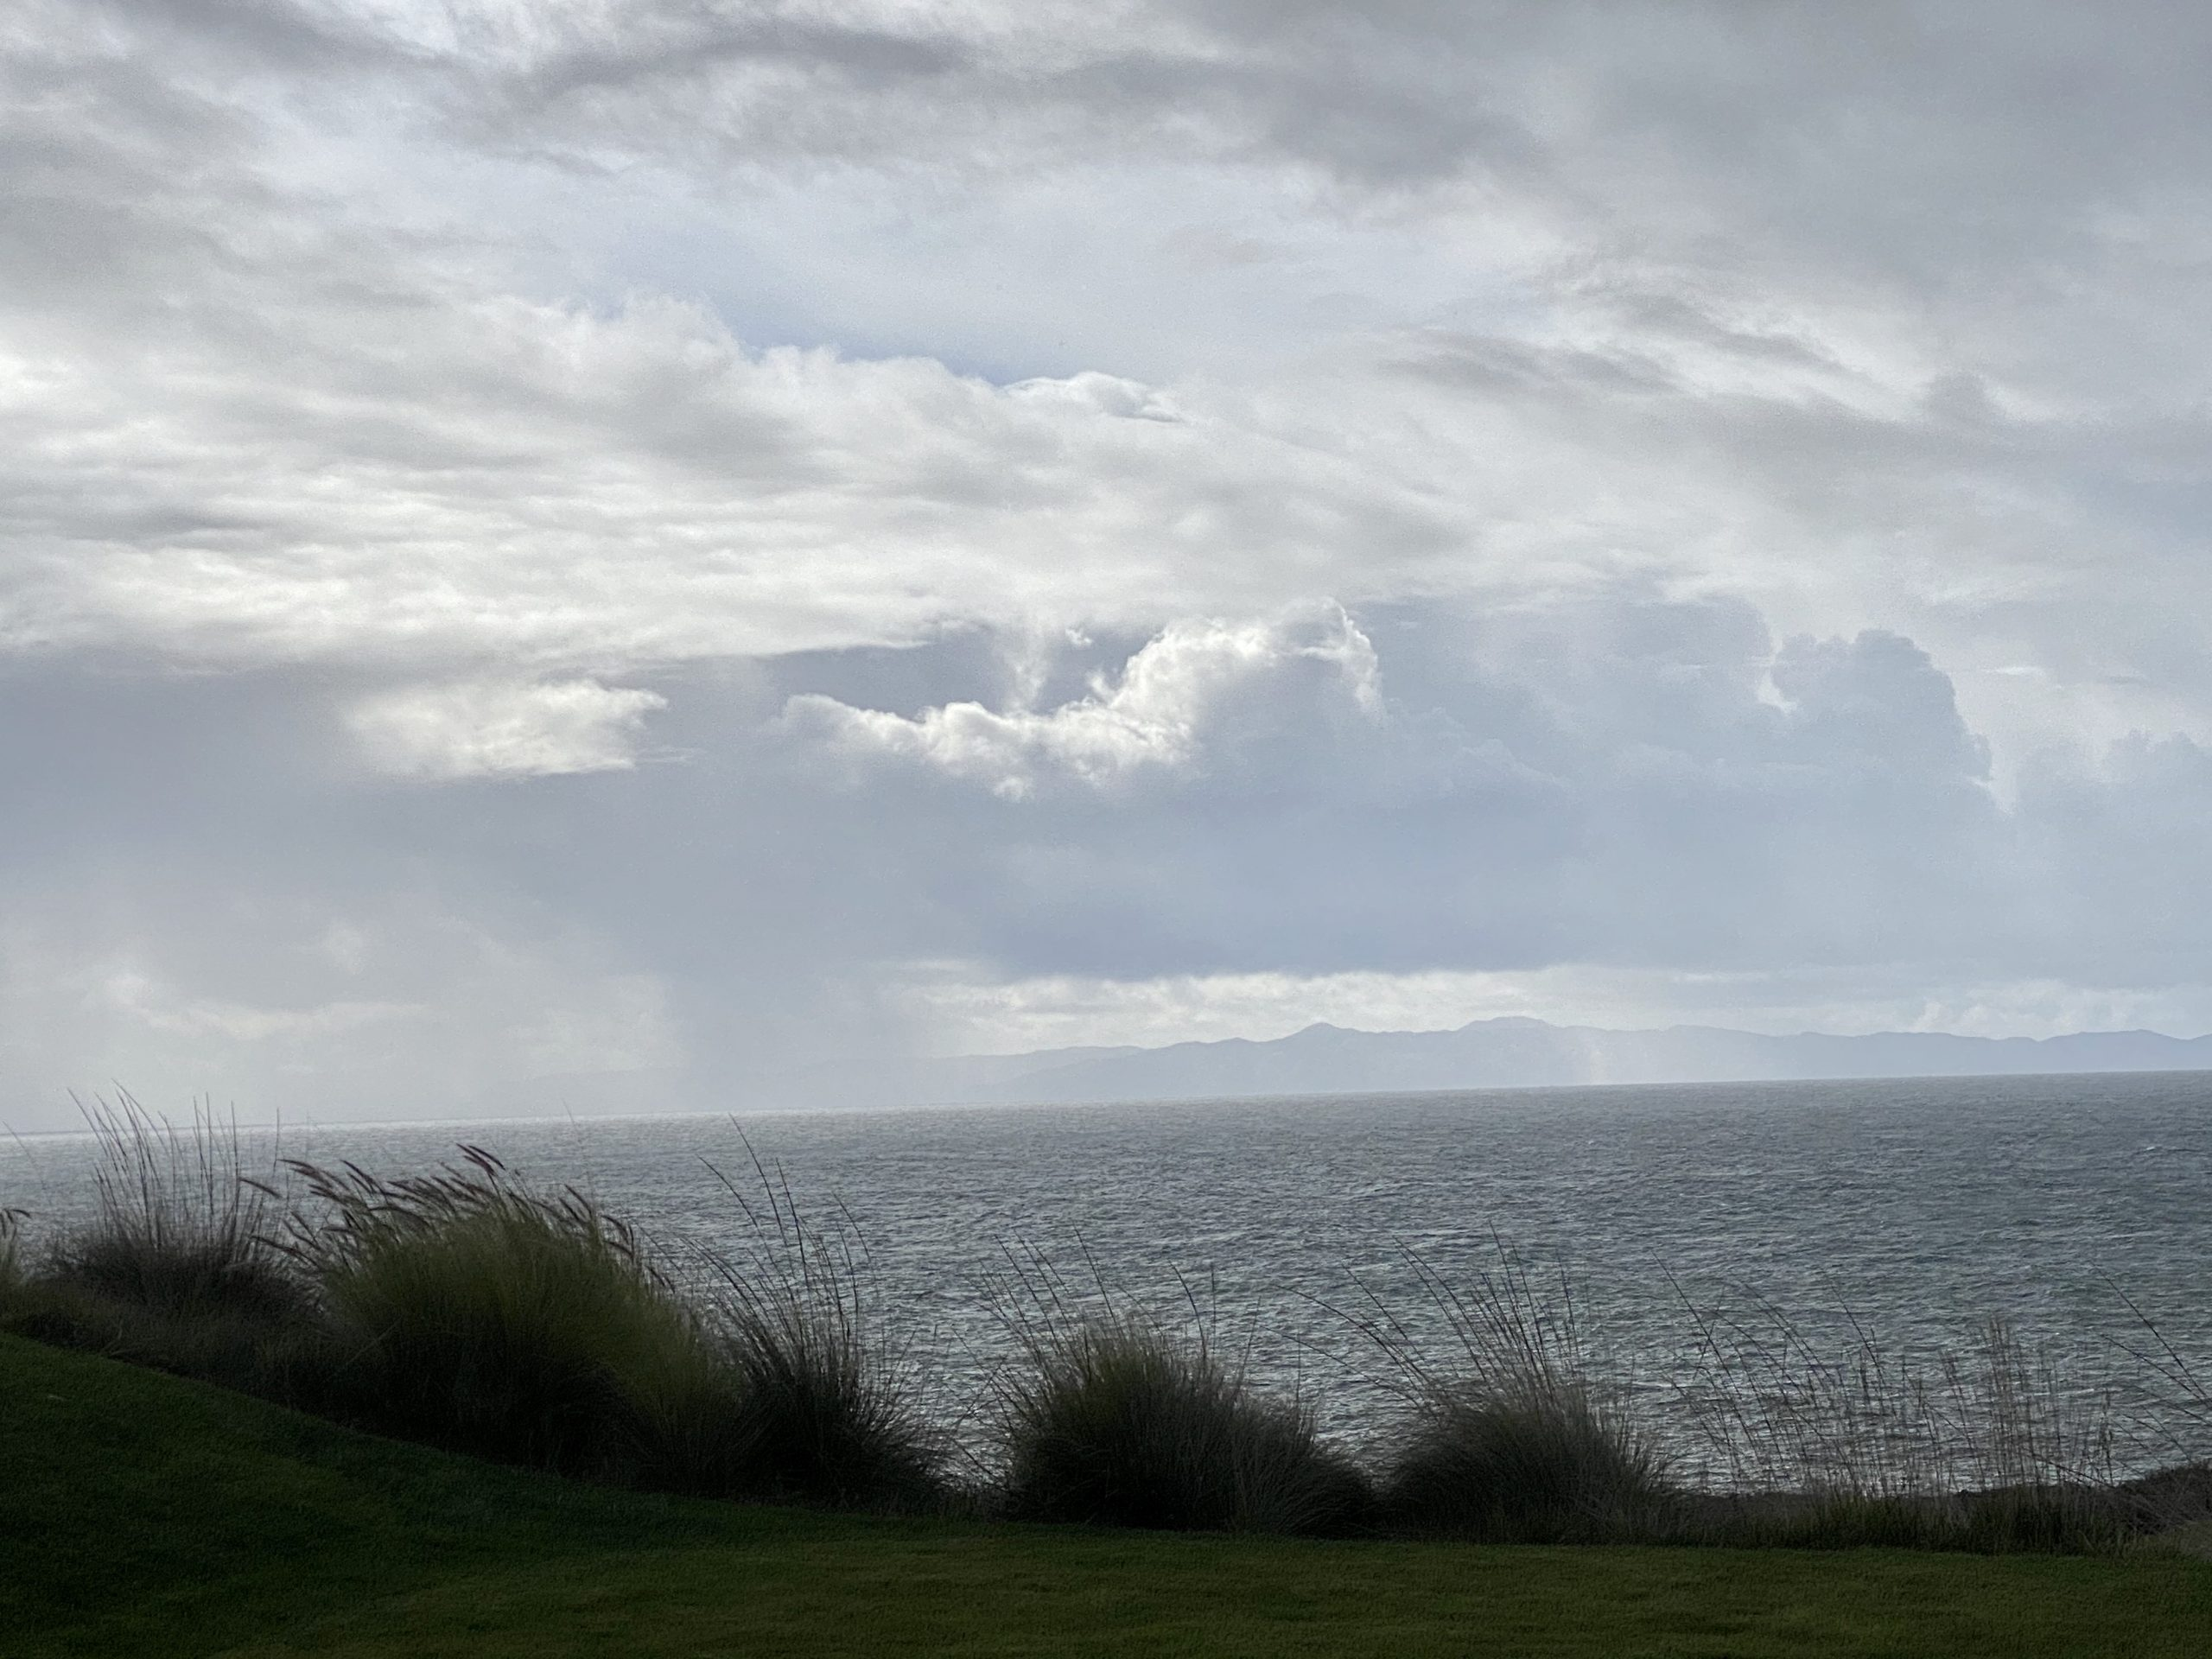 Storm blows over the Pacific Ocean near Terranea Resort in Rancho Palos Verdes, CA